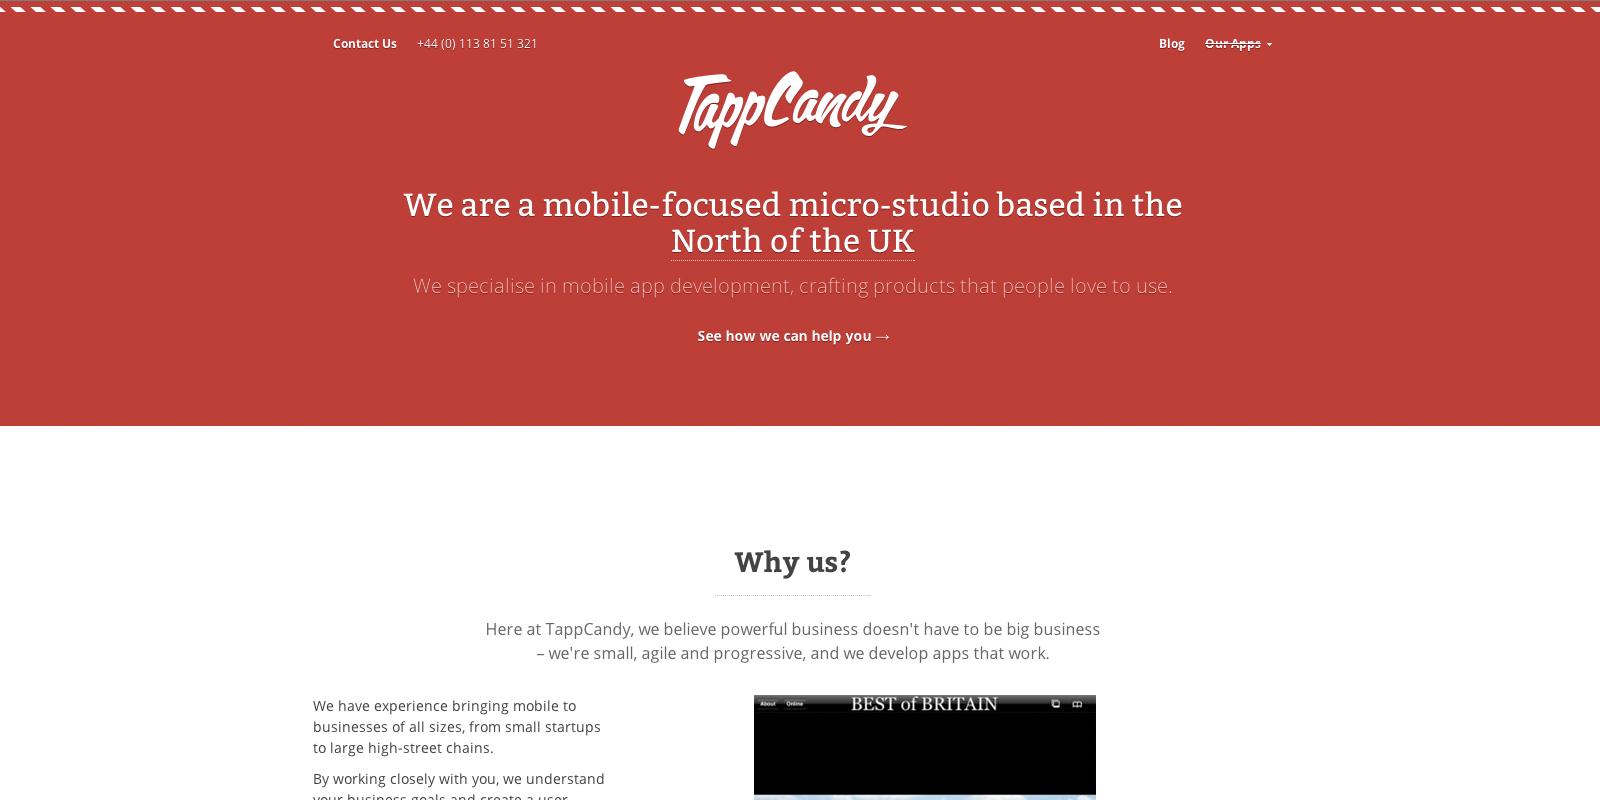 TappCandy Website Screenshot